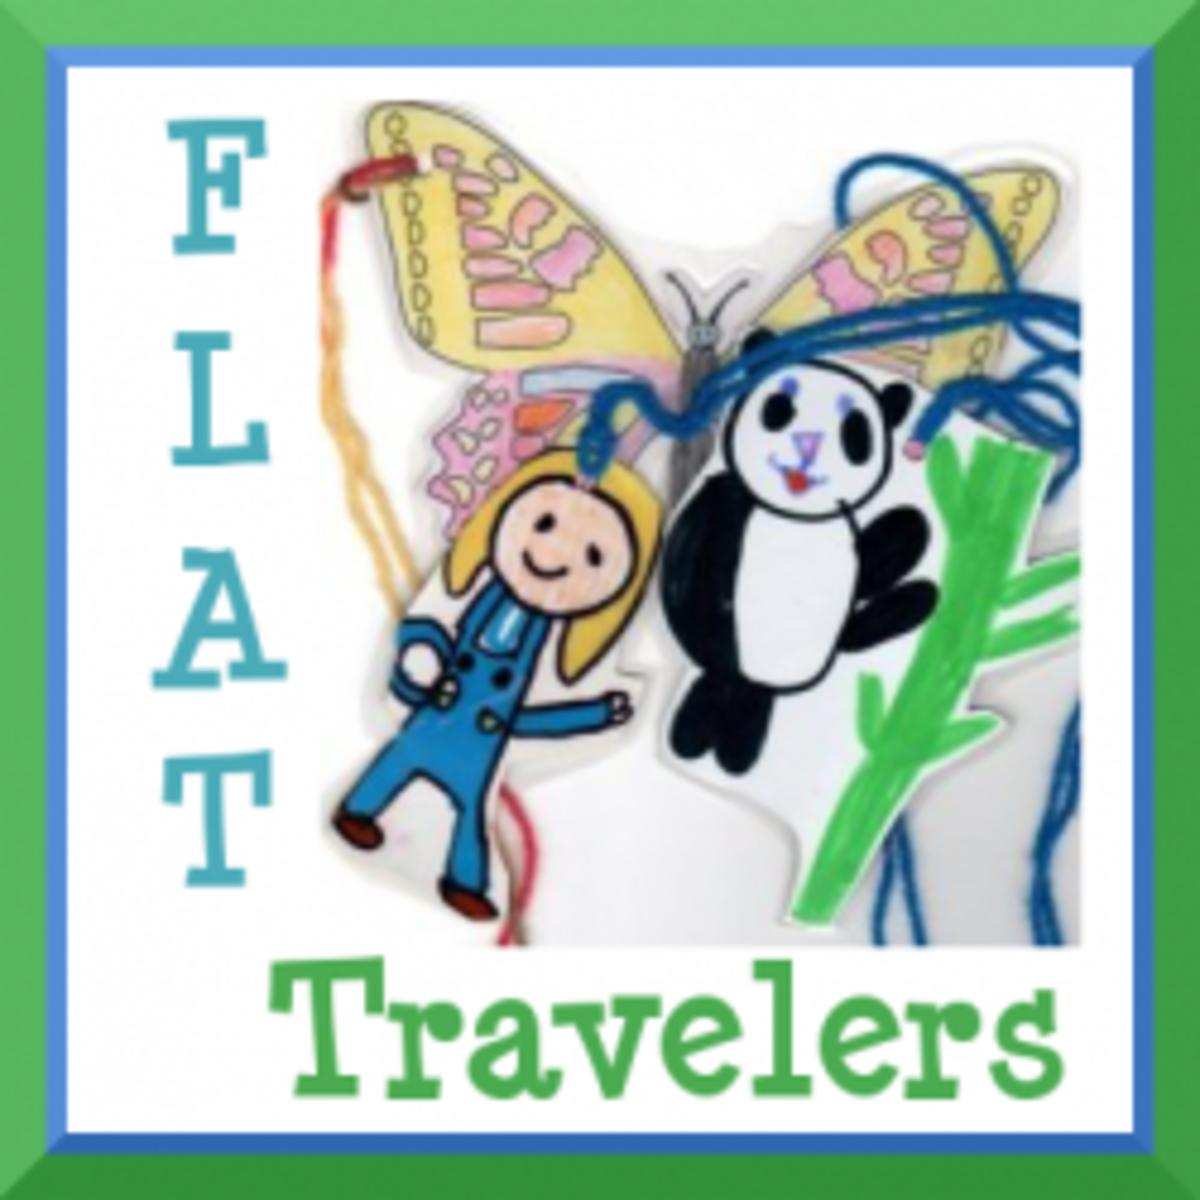 Flat Travelers